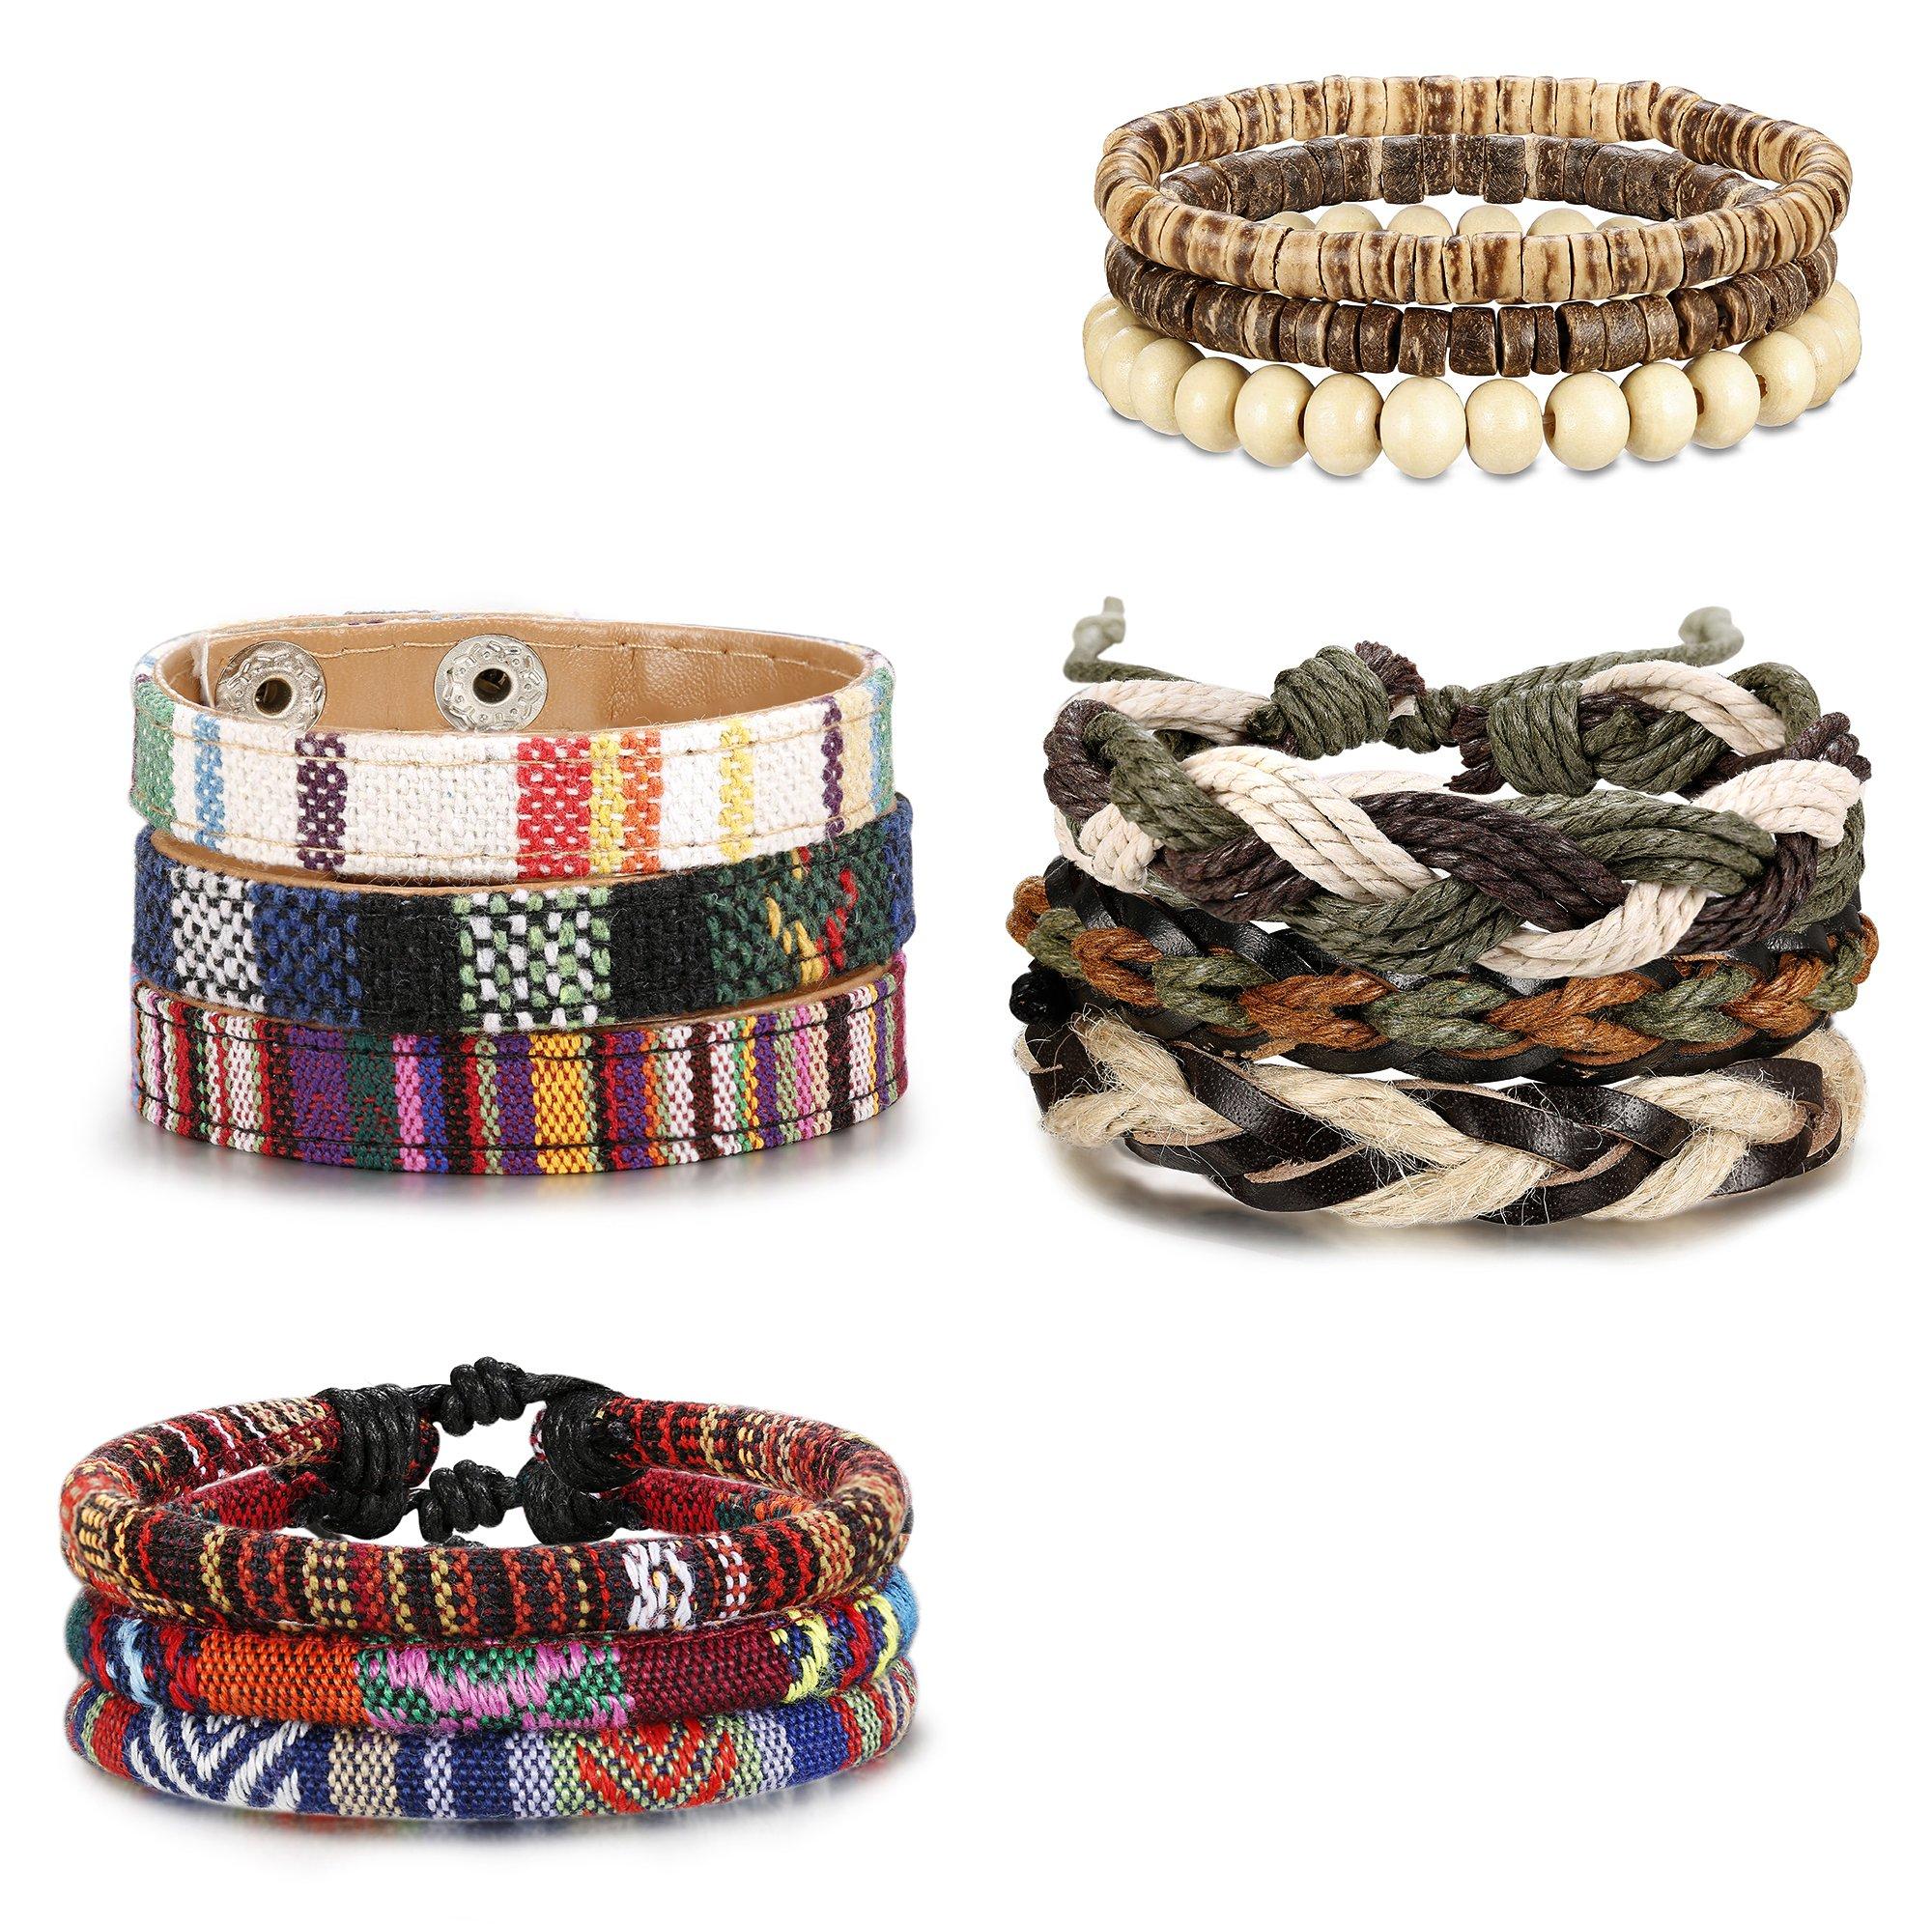 Jstyle 6-12Pcs Wrap Bracelets for Women Men Hemp Cords Ethnic Tribal Bracelet Wooden Beads Leather Bracelets Wristbands by Jstyle (Image #2)